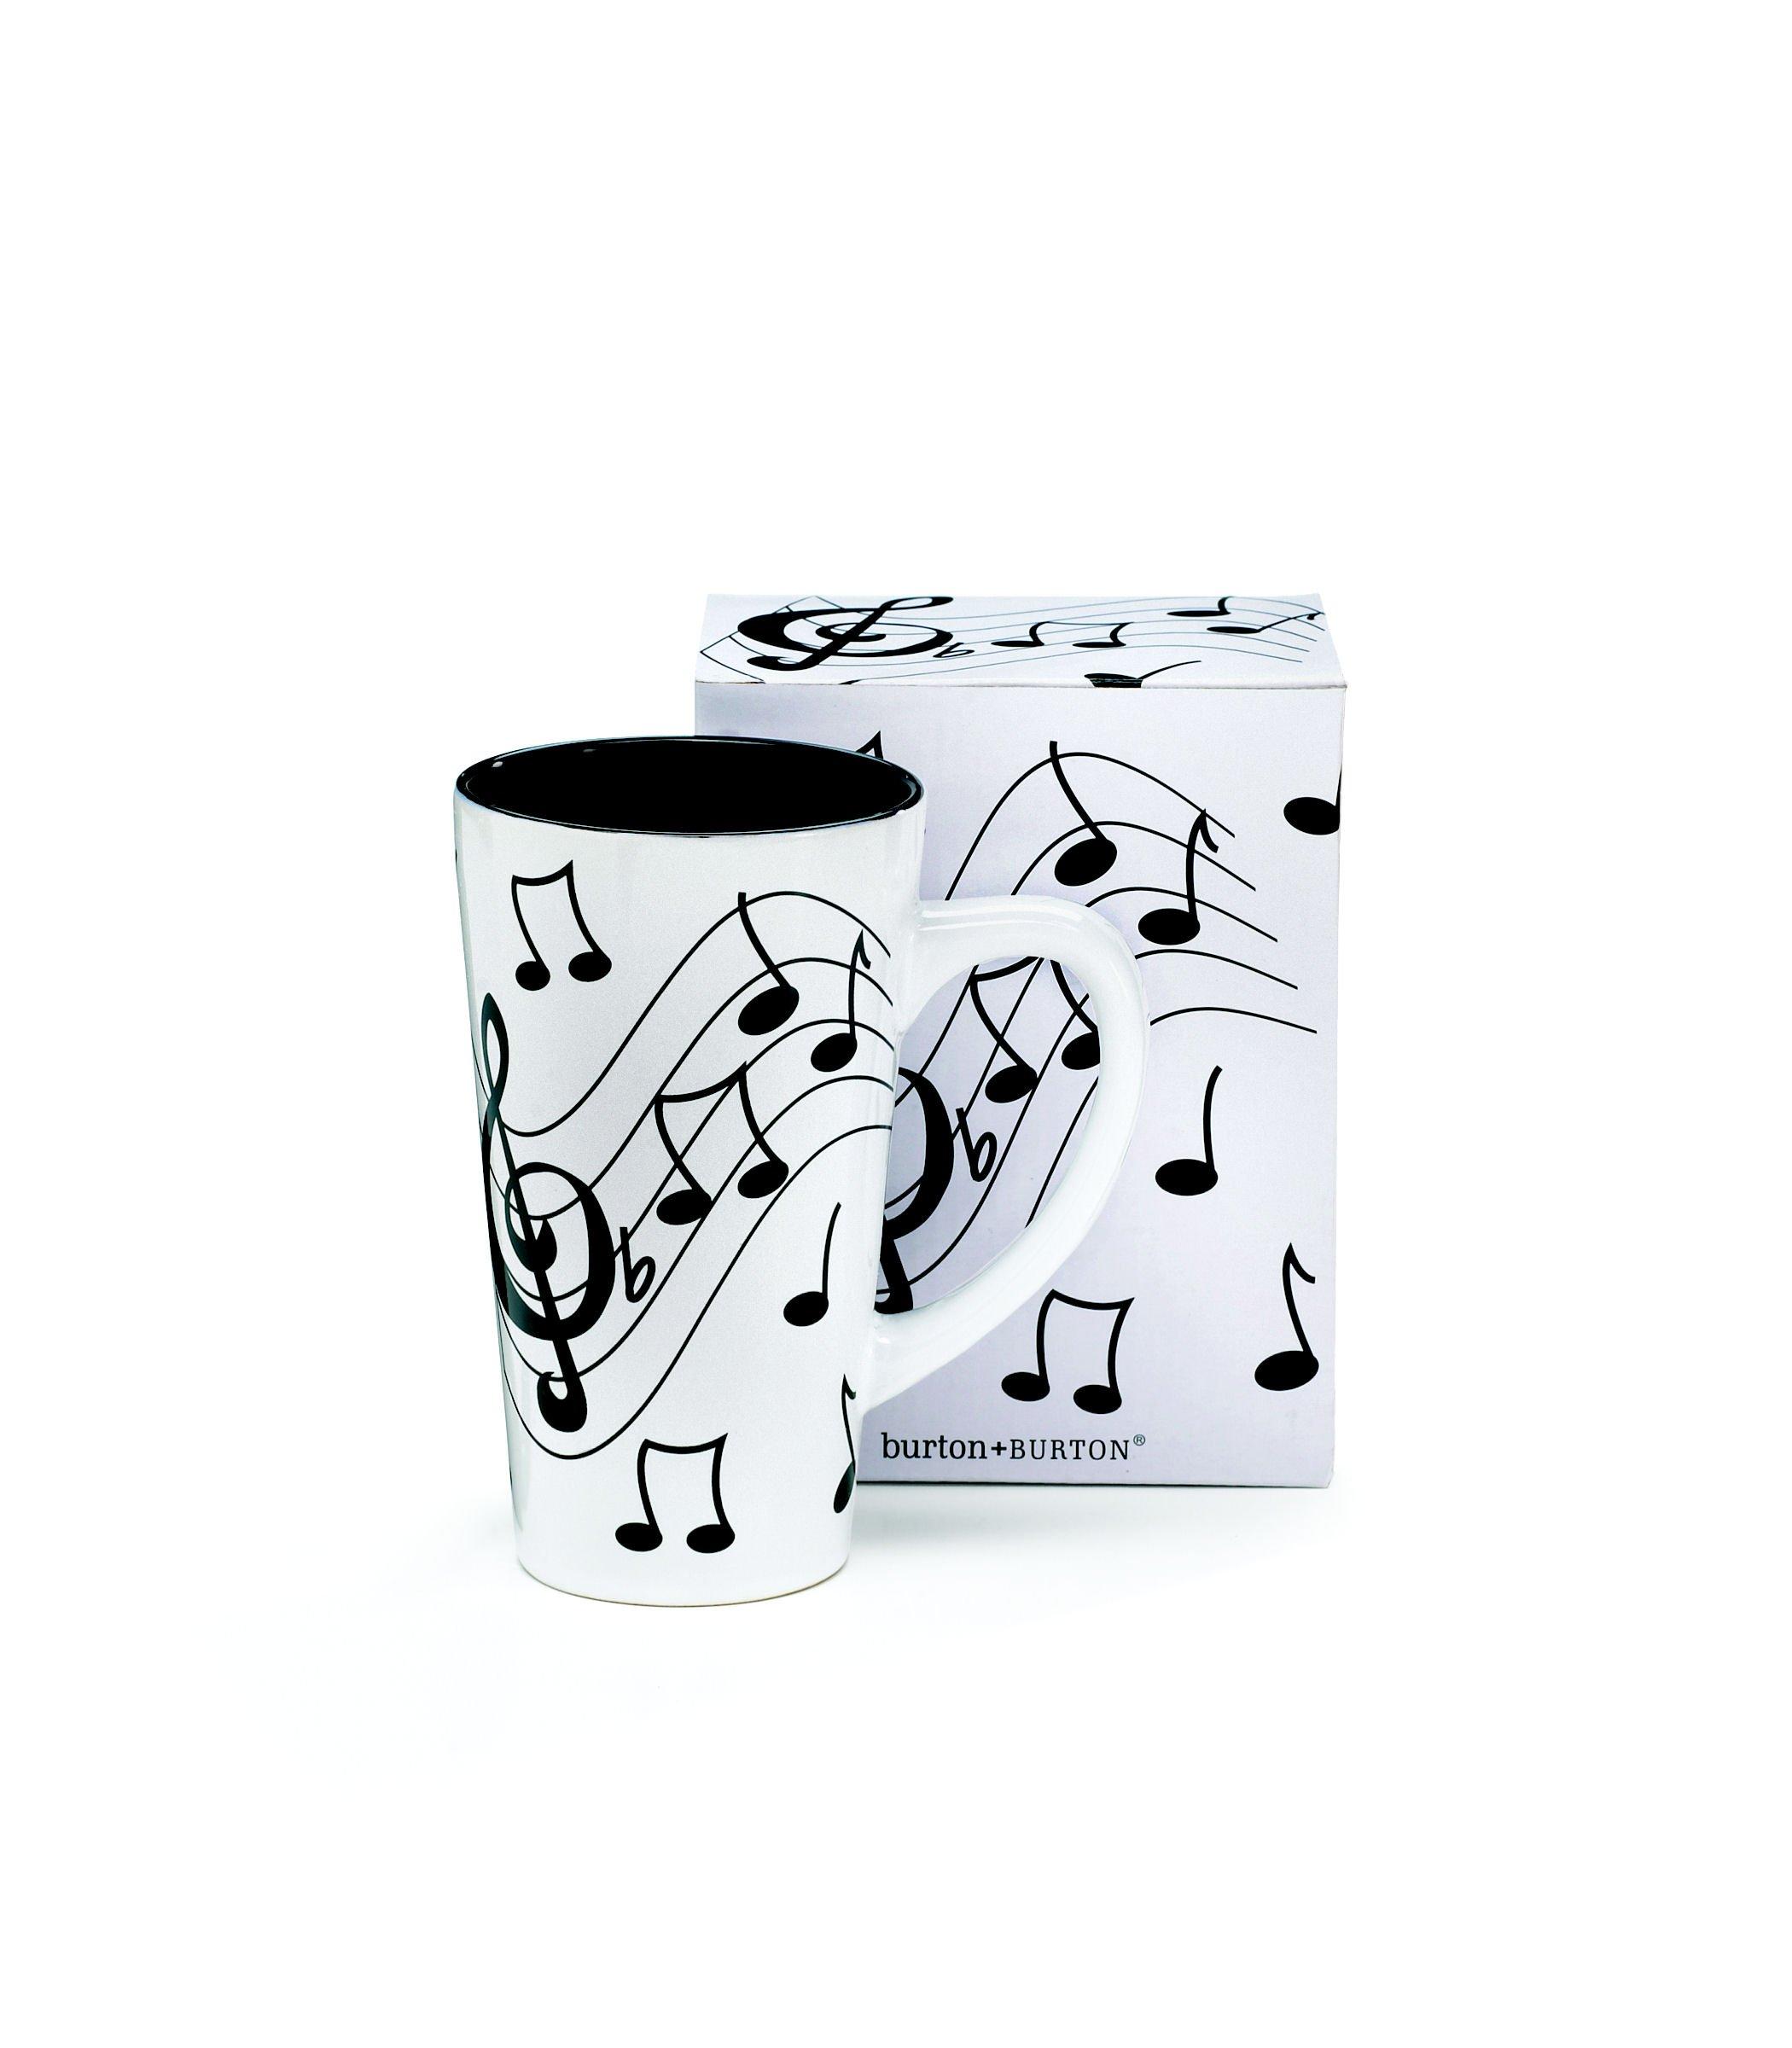 Musical Note Jazz Ceramic Coffee/Tea Travel Mug Treble Clef - 16 Oz by burton+BURTON